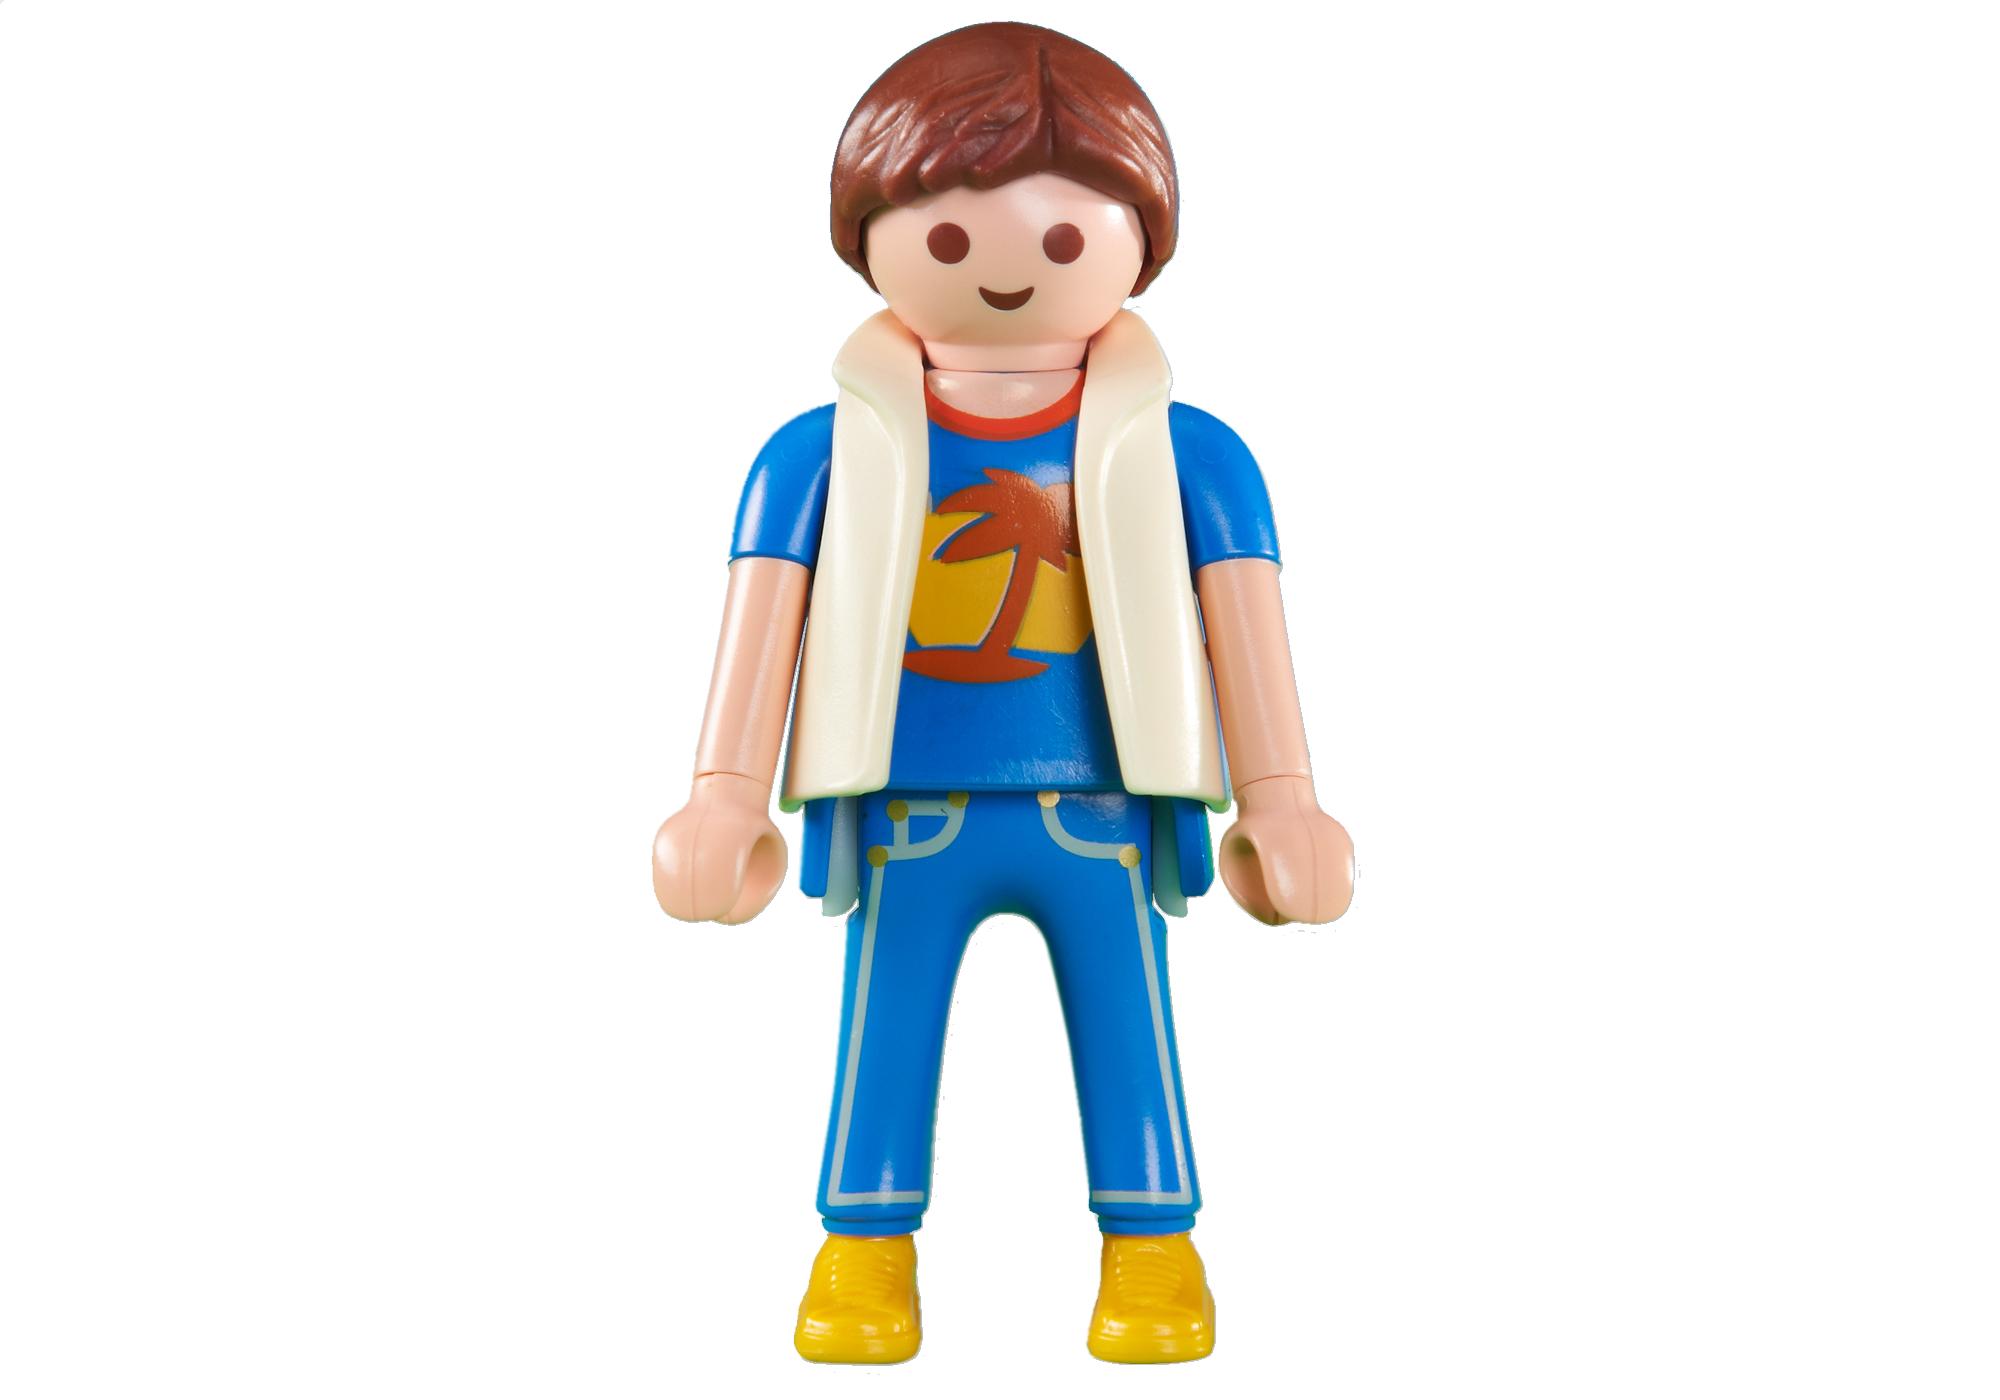 http://media.playmobil.com/i/playmobil/30009042_product_detail